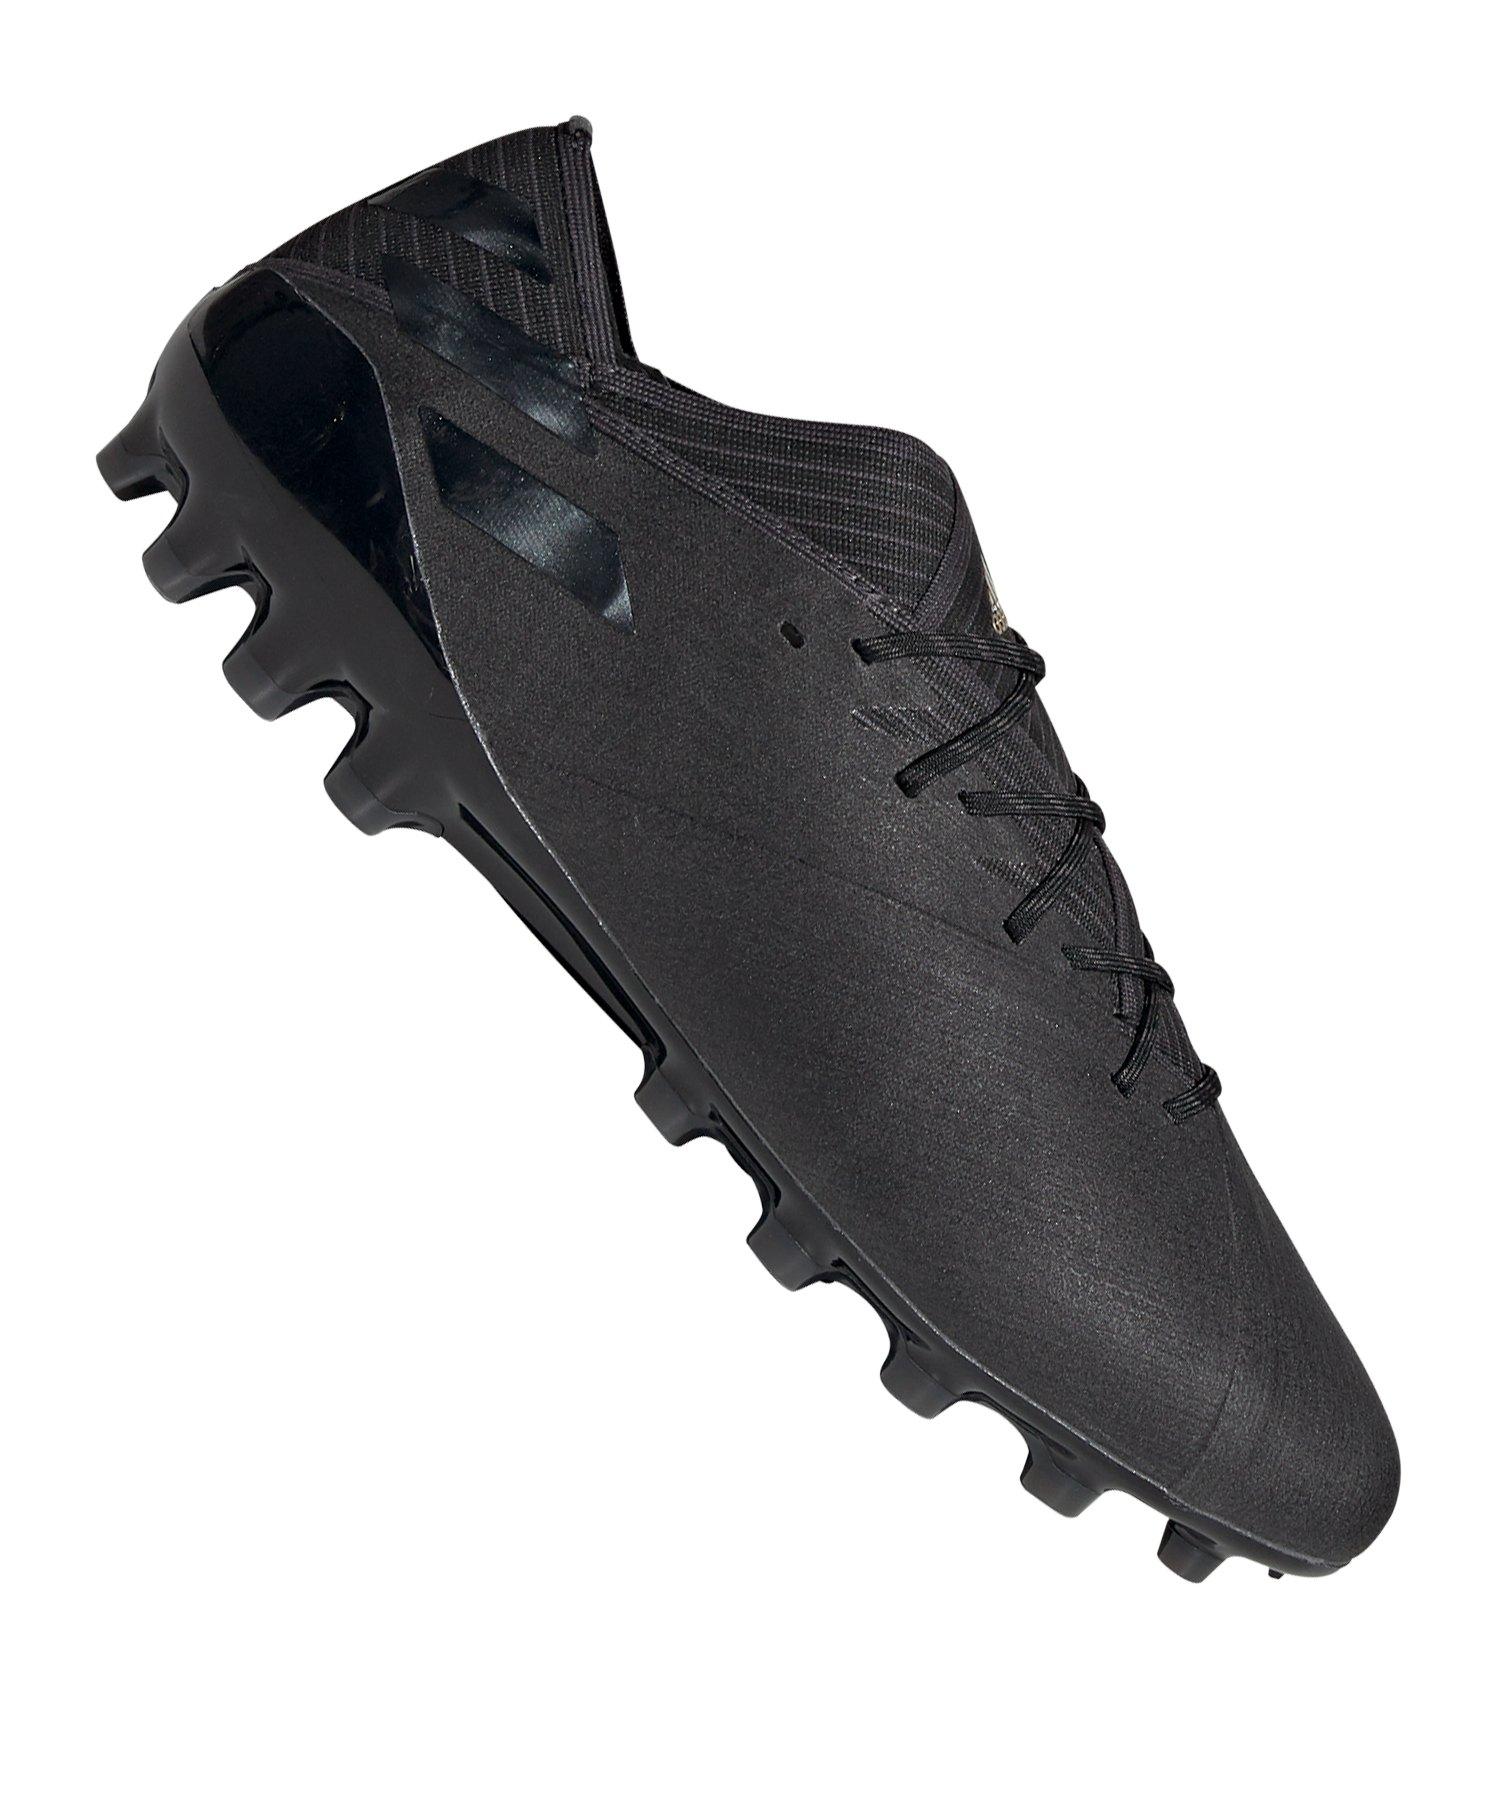 Angemessener Preis Herren Nike Air Force 1 '07 LV8 'Camo